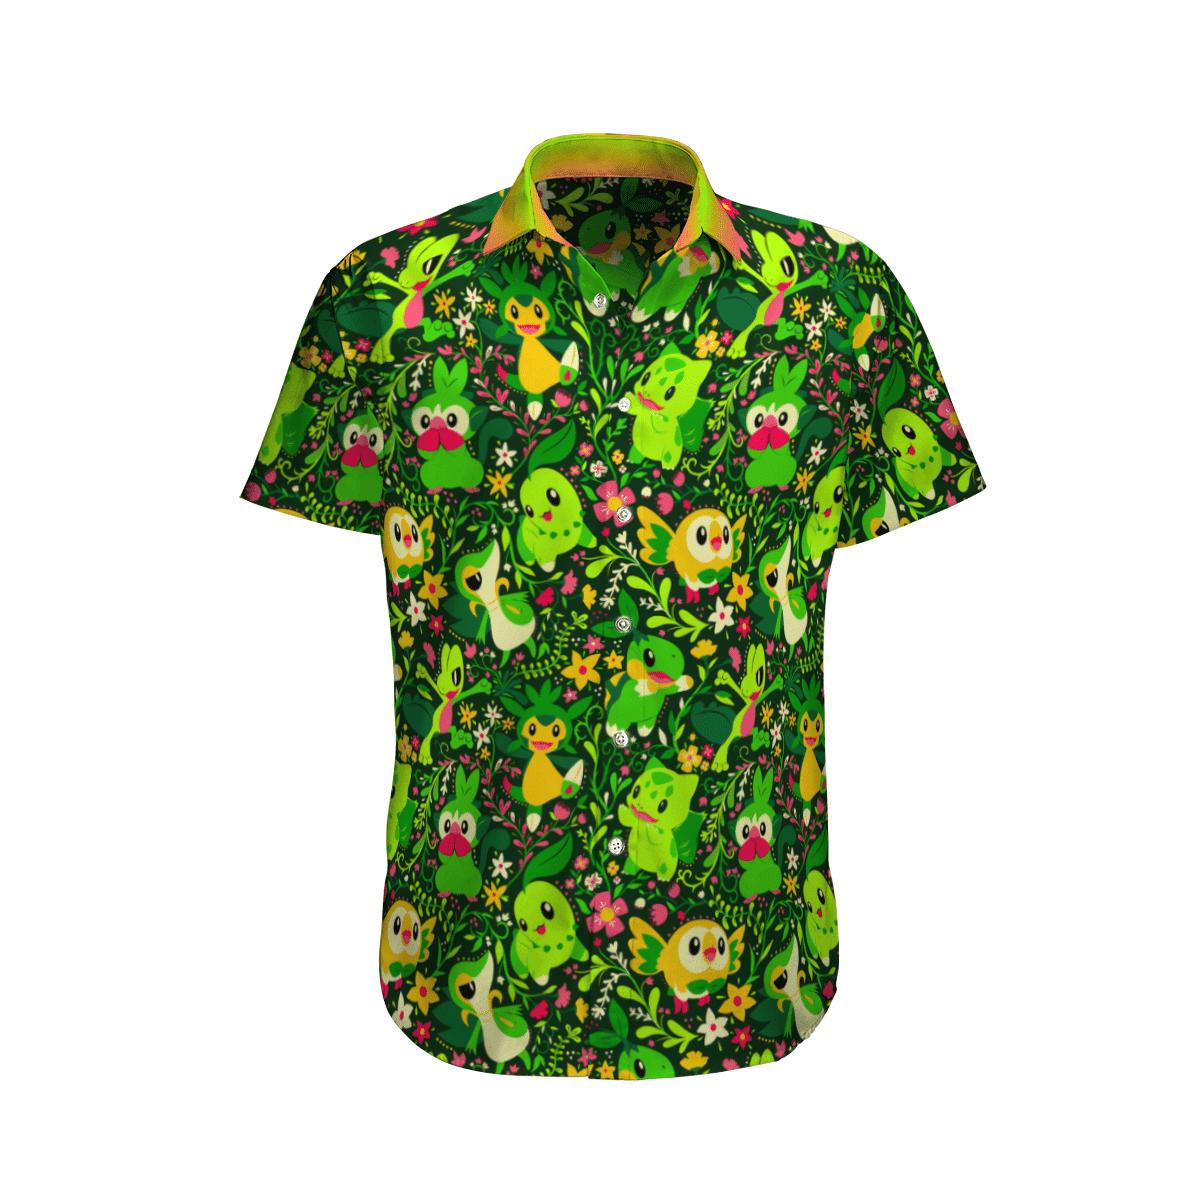 Grass Pokemon Hawaiian Shirt And Shorts